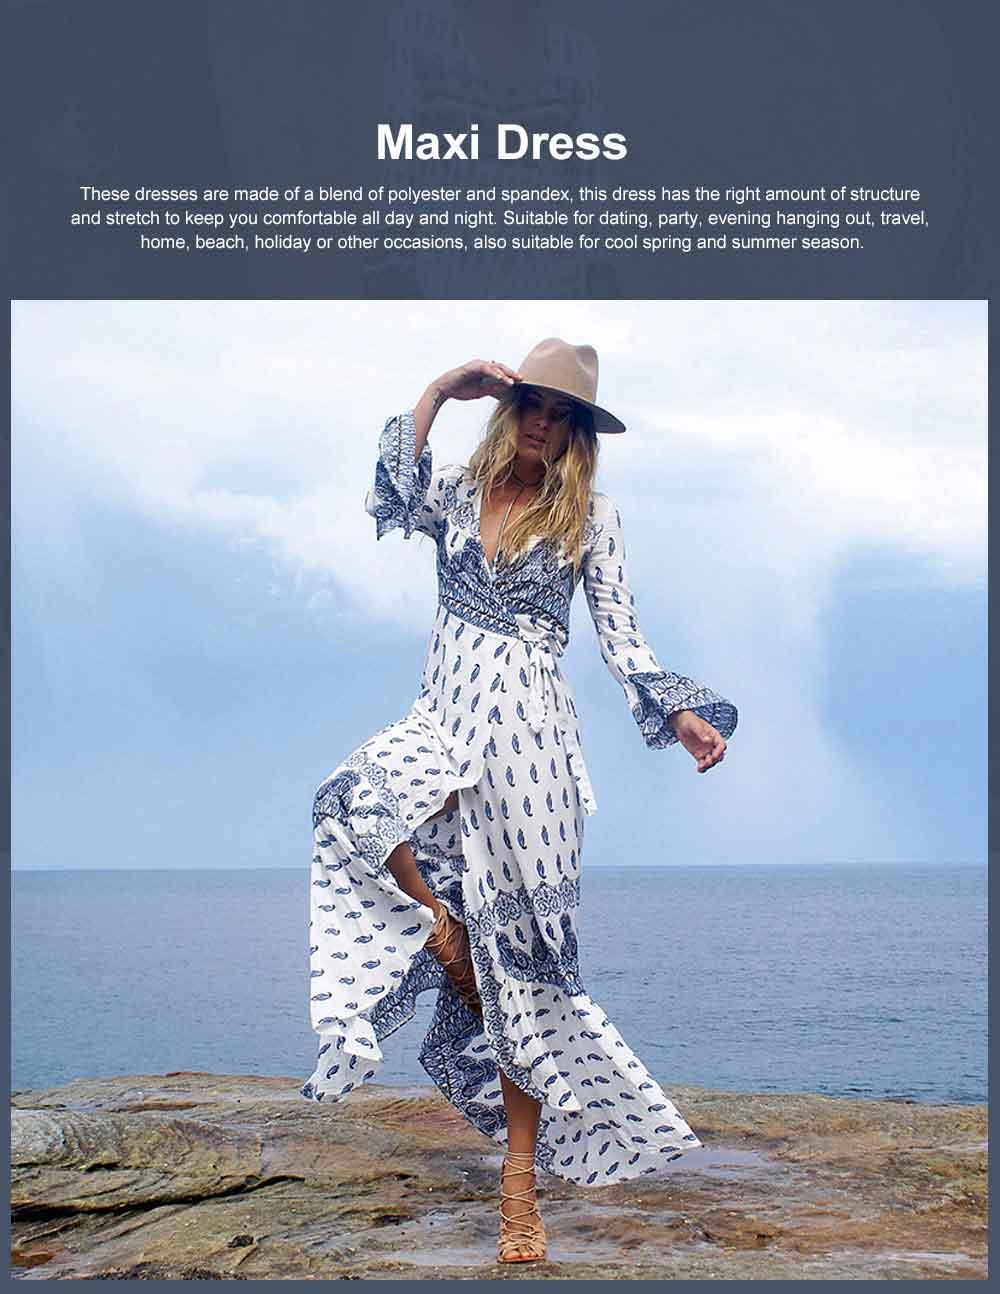 Women Large Size Long Dress, Floral Printed Maxi Dress Deep V-neck Irregular Dresses, Beach Dresses Bohemian Side Split Dresses 0